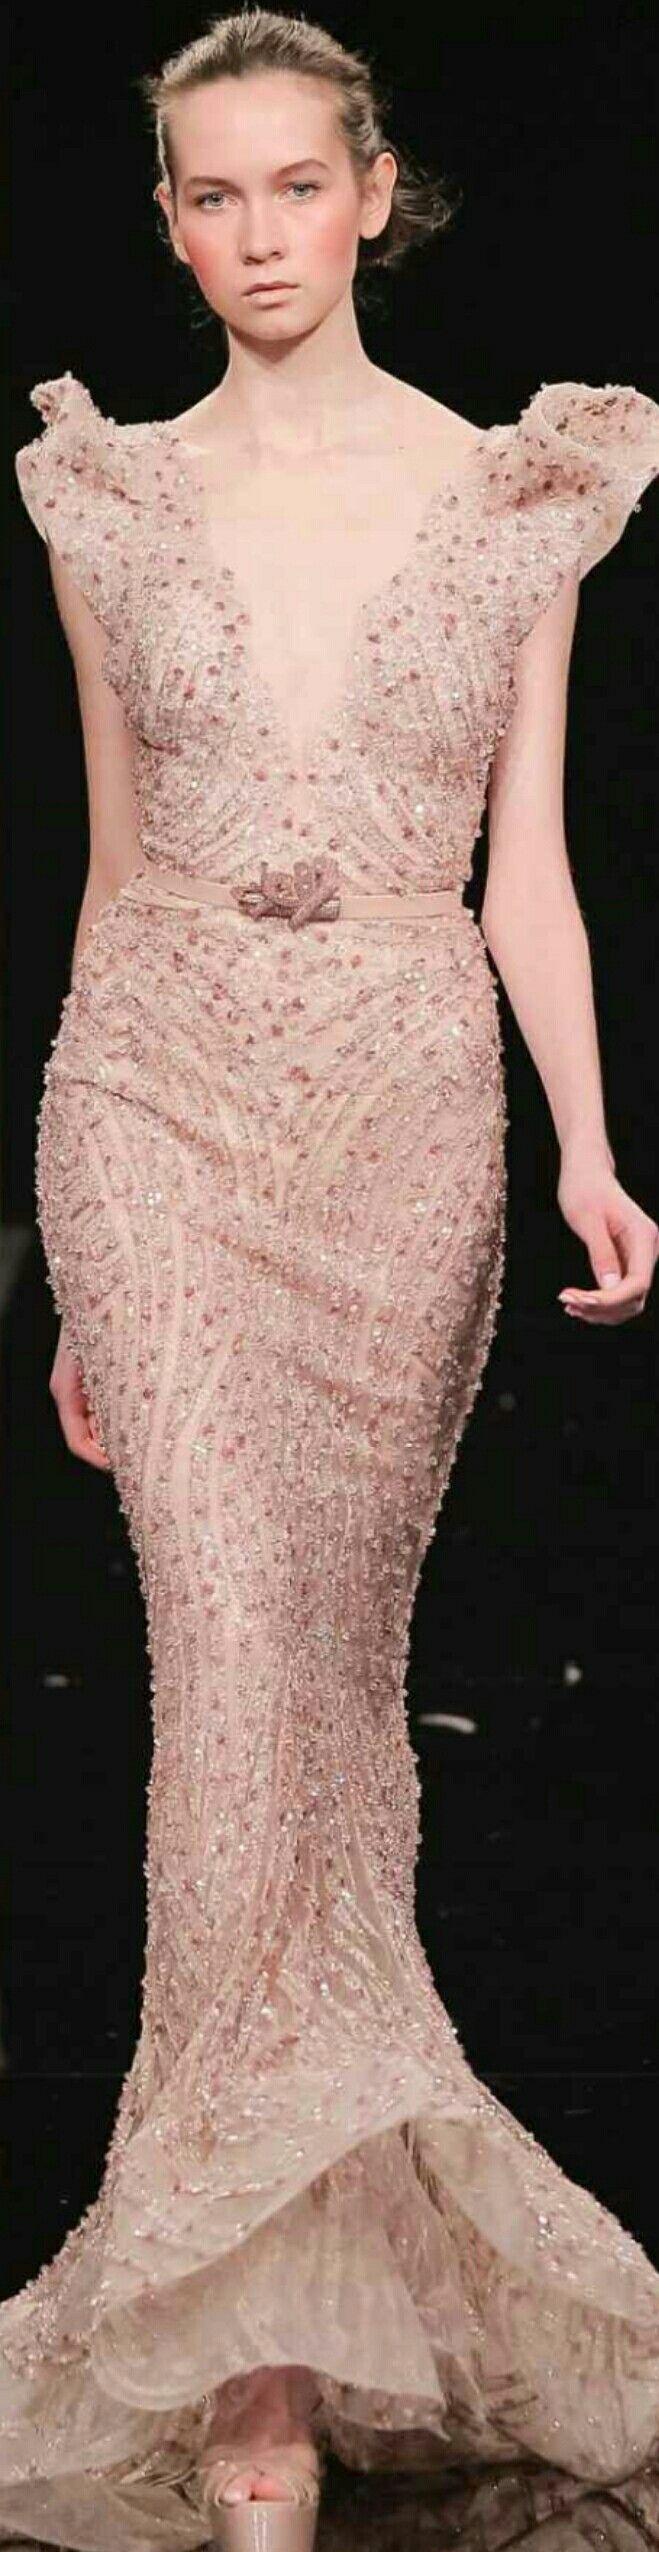 67 best ZİAD NAKAT 2016/17 (2) images on Pinterest | Fashion 2017 ...